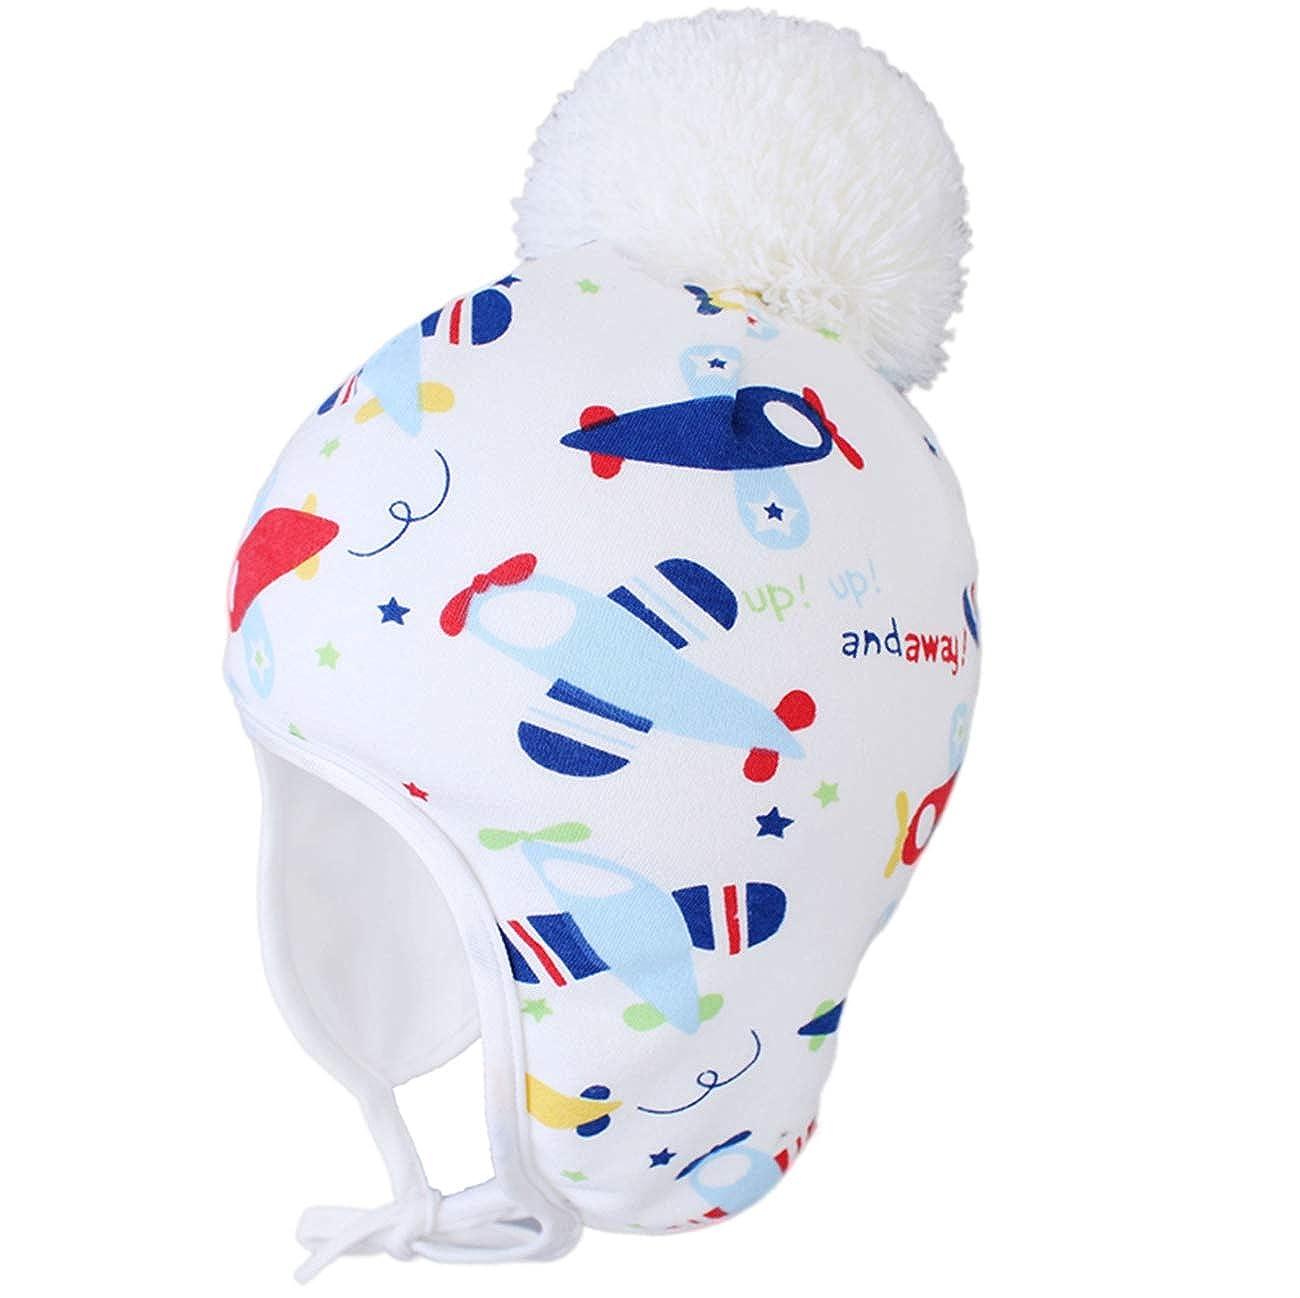 LLmoway Baby Toddler Beanie Hats Boys Girls Fall Winter Fleece Hat with Earflap